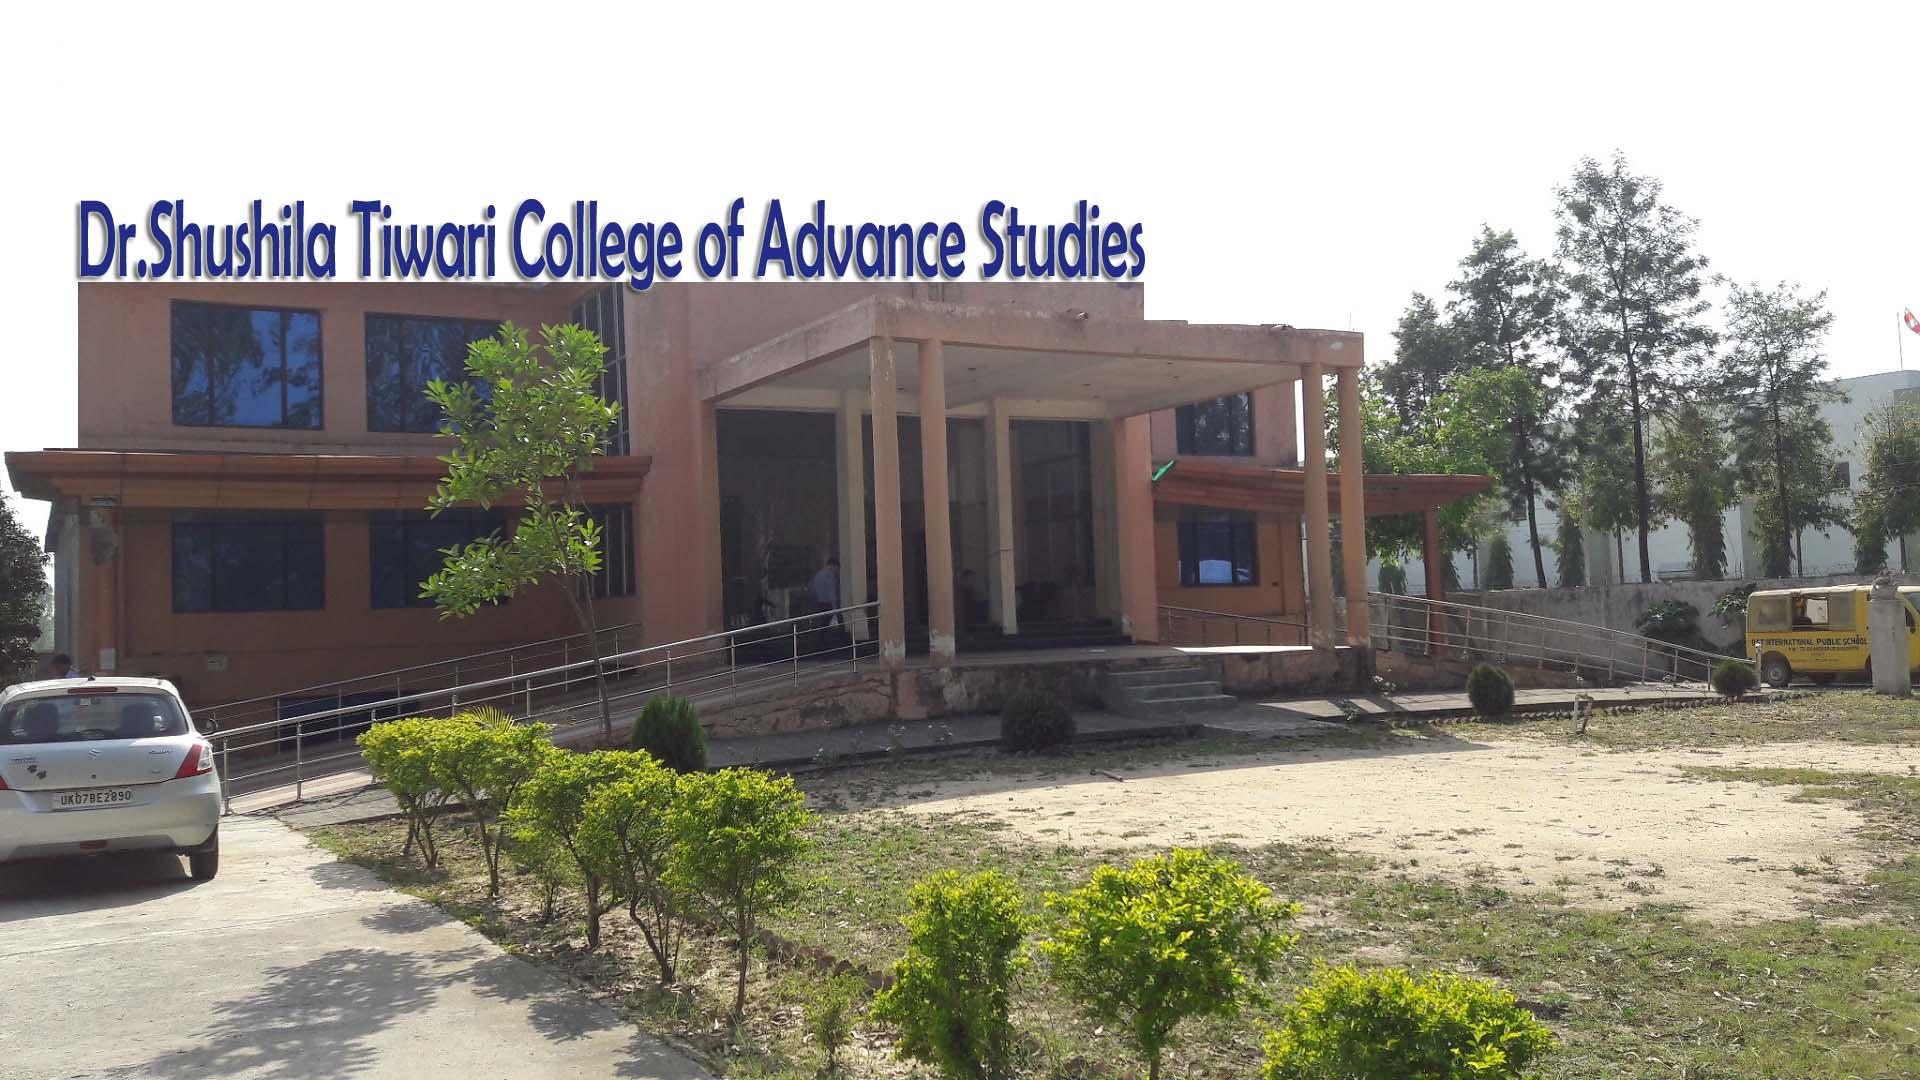 Dr. Shushila Tiwari College of Advance Studies, Roorkee